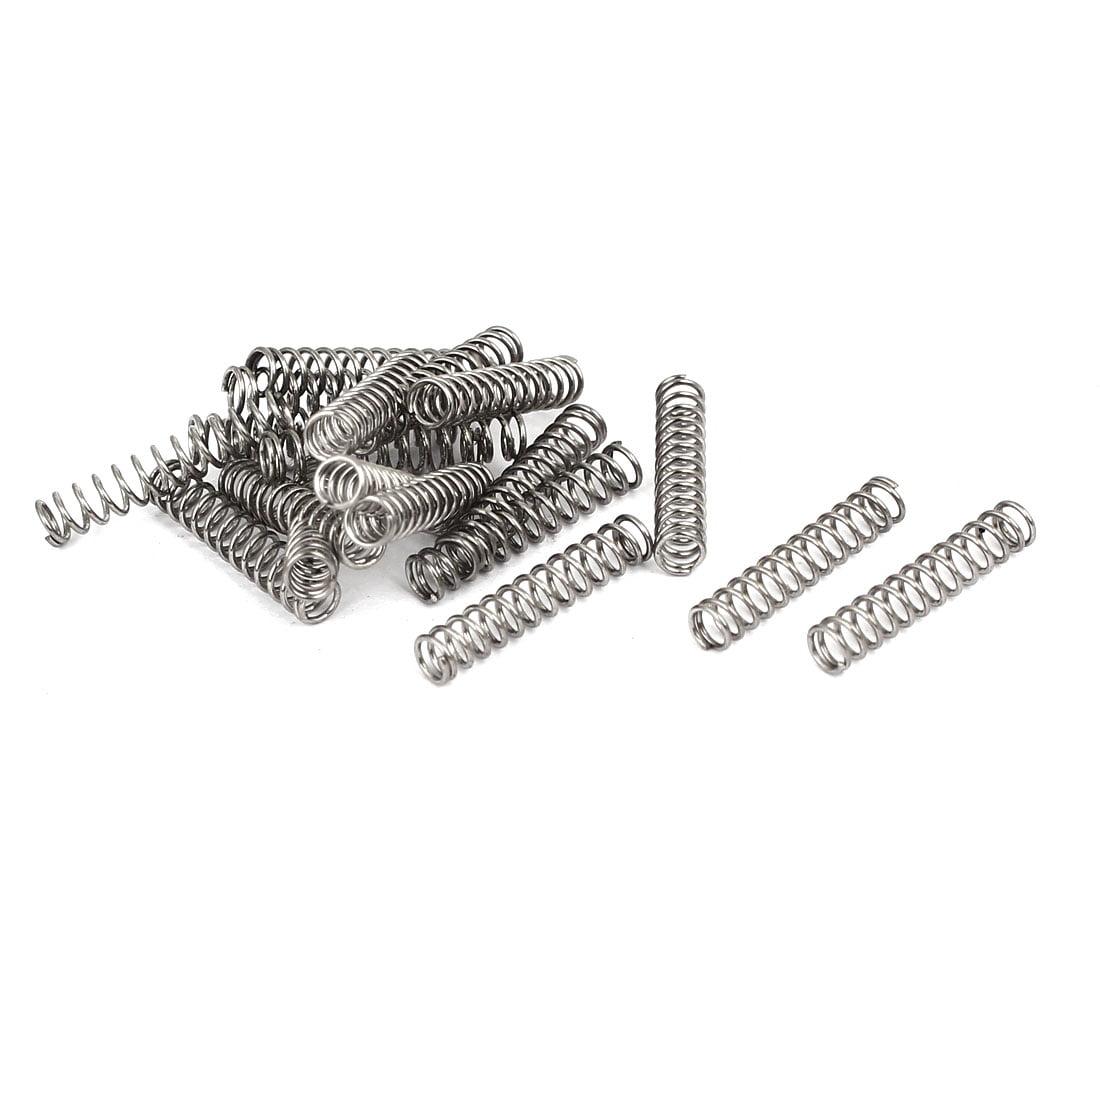 1.2mmx14mmx300mm Manganese Steel Extension Tension Springs Black 2pcs